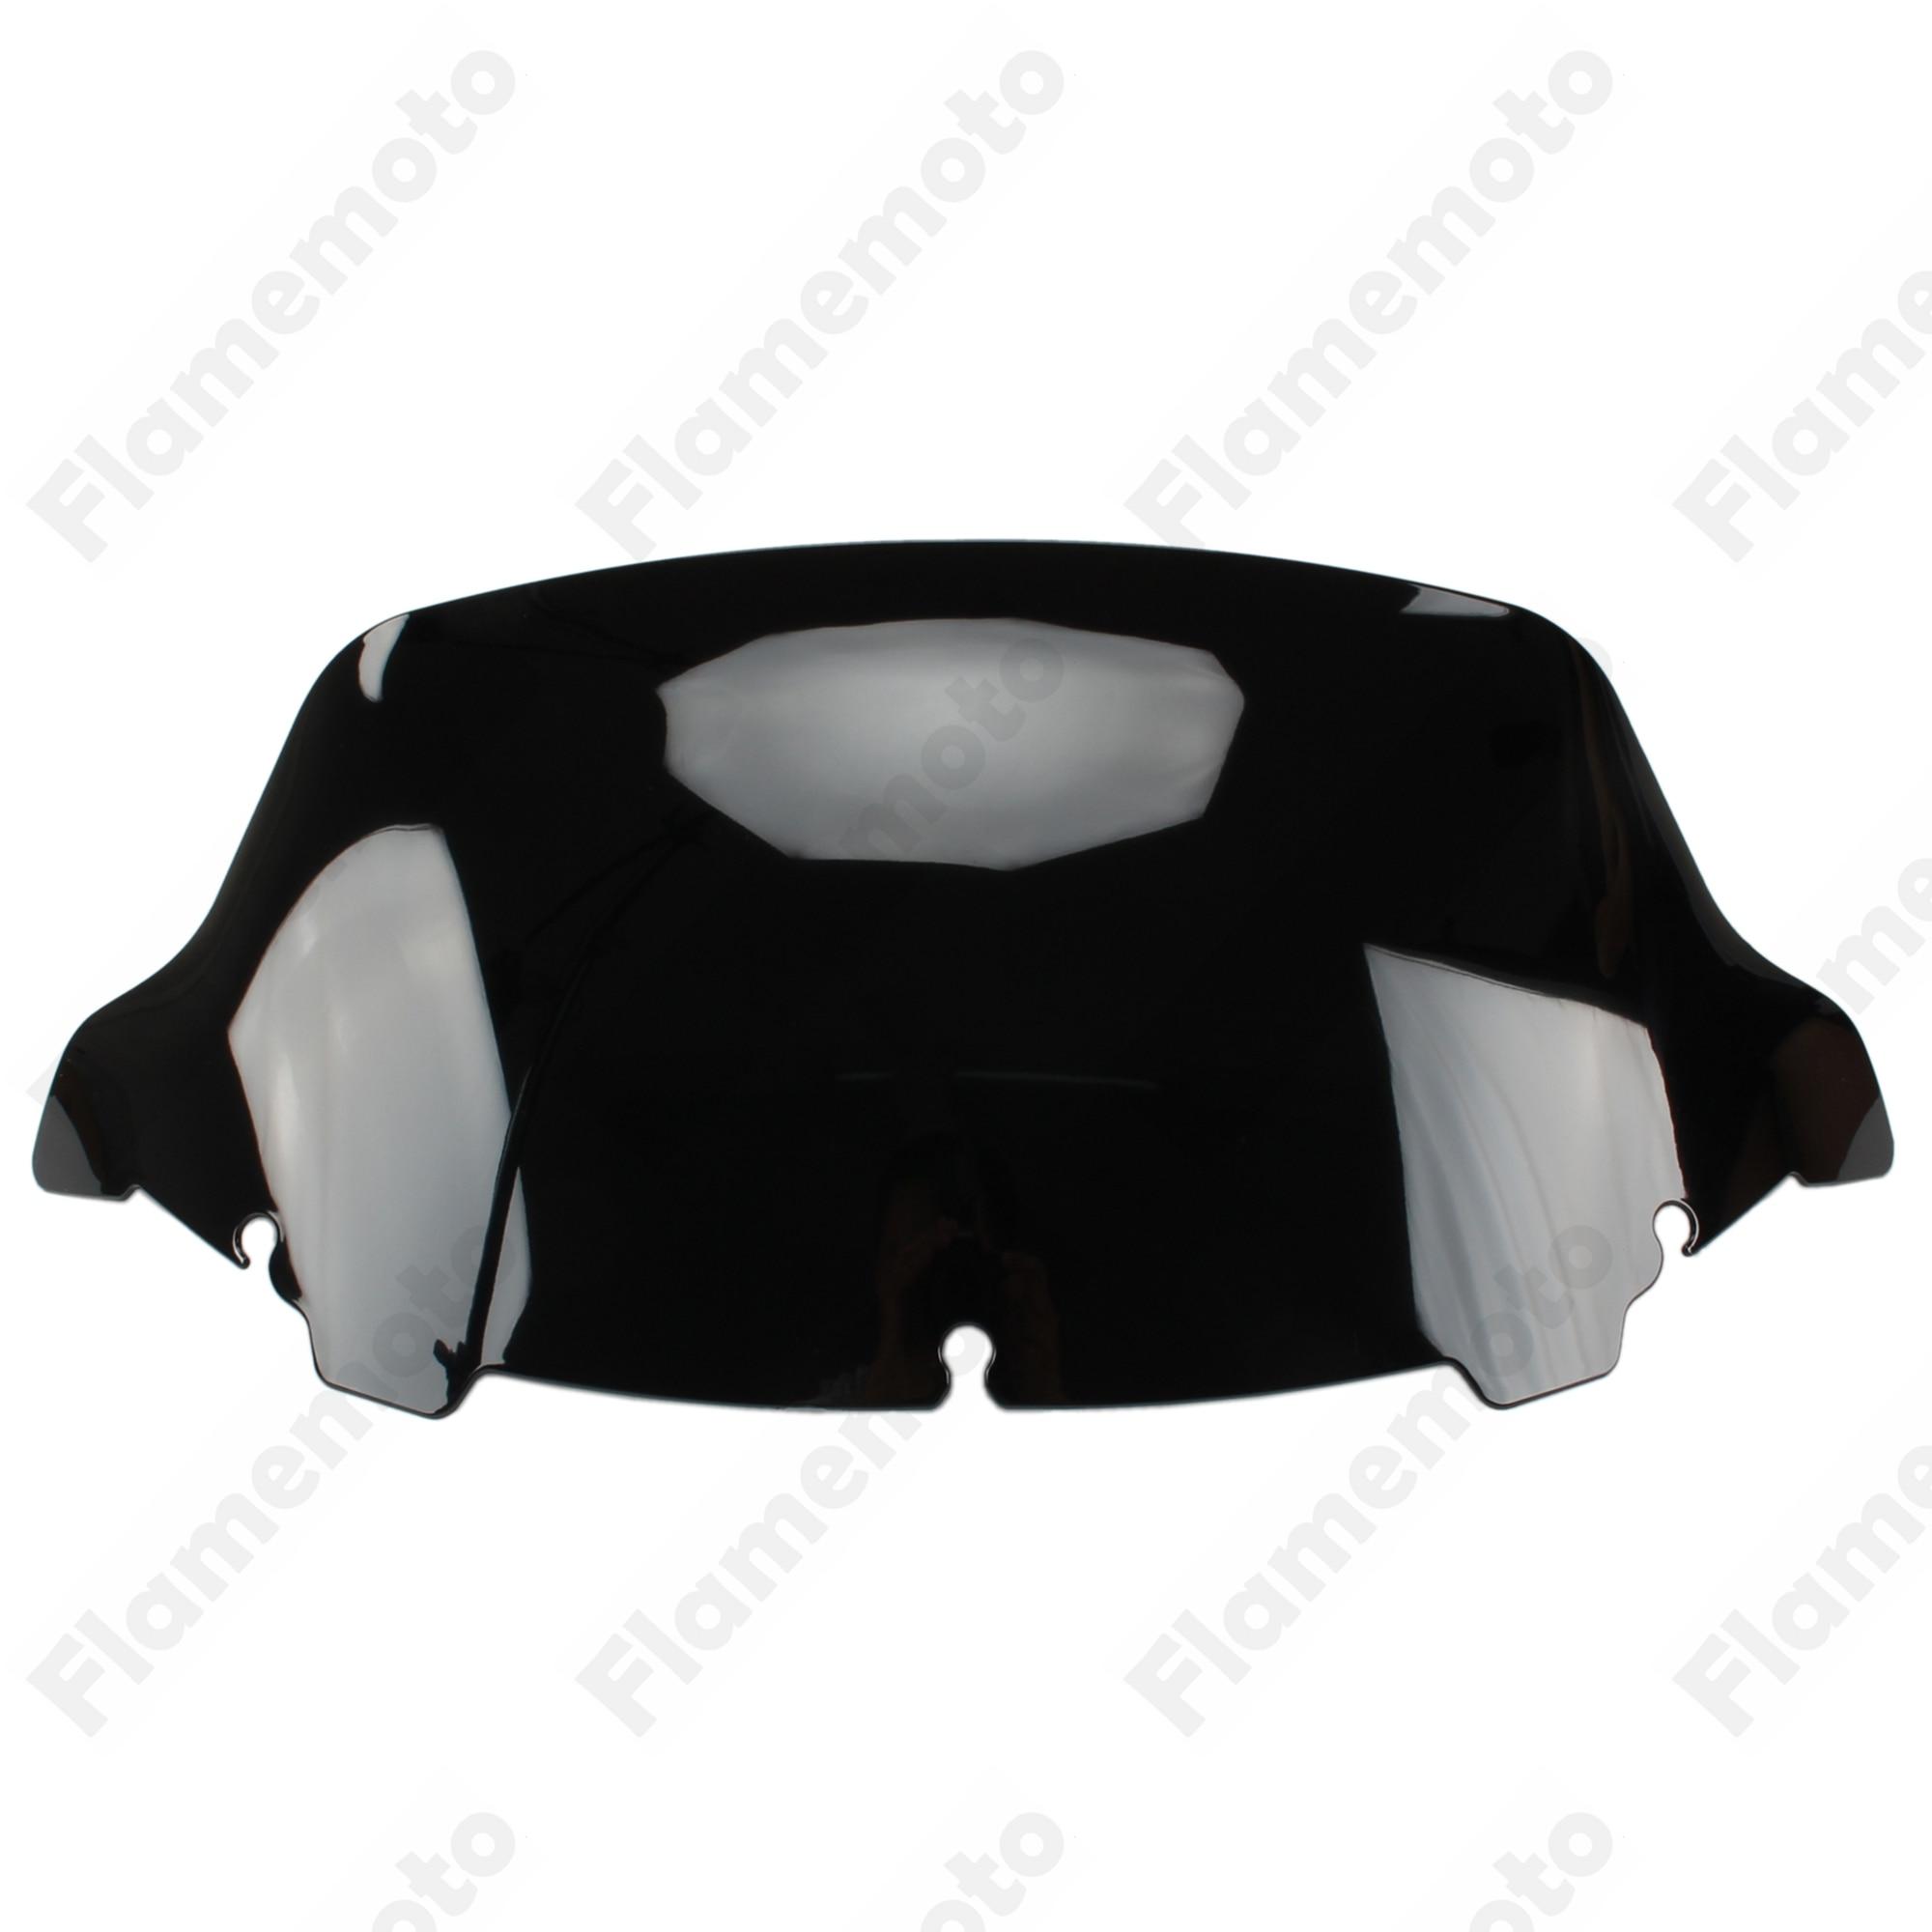 Motorcycle Accessories Dark Smoke PVC 10